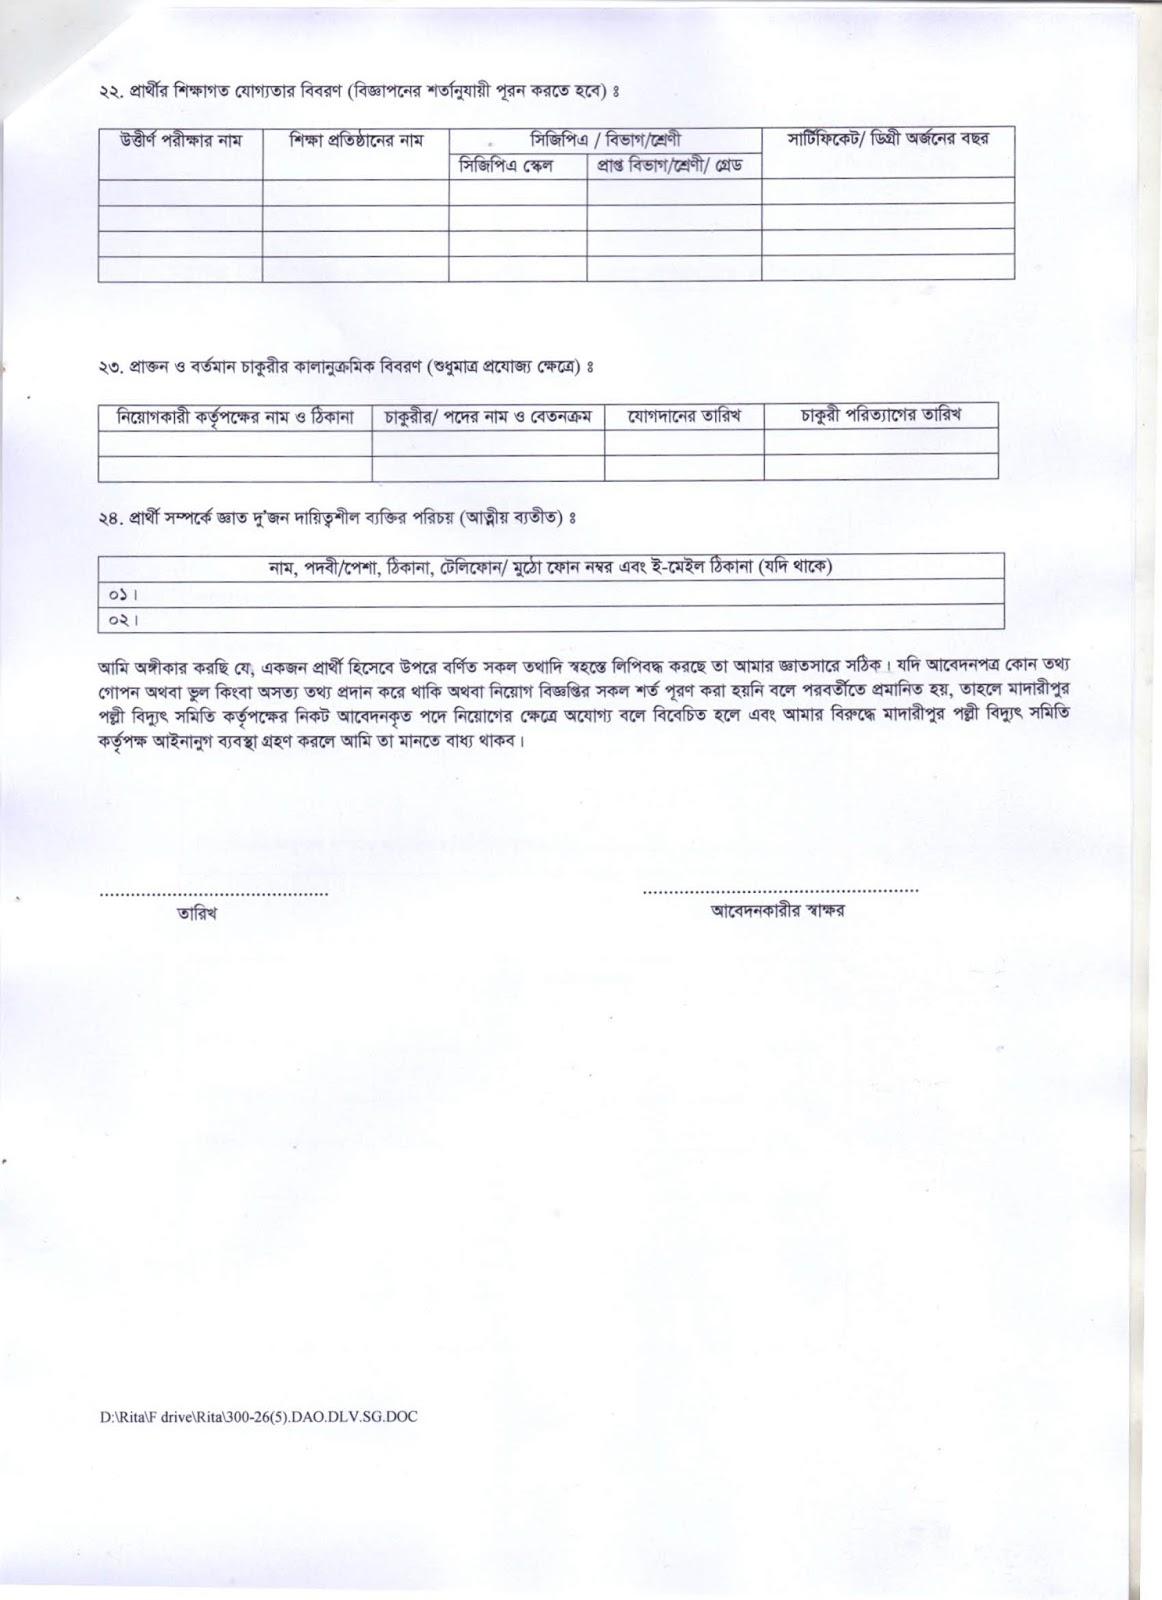 Madaripur Palli Bidyut Samity Job Application Form